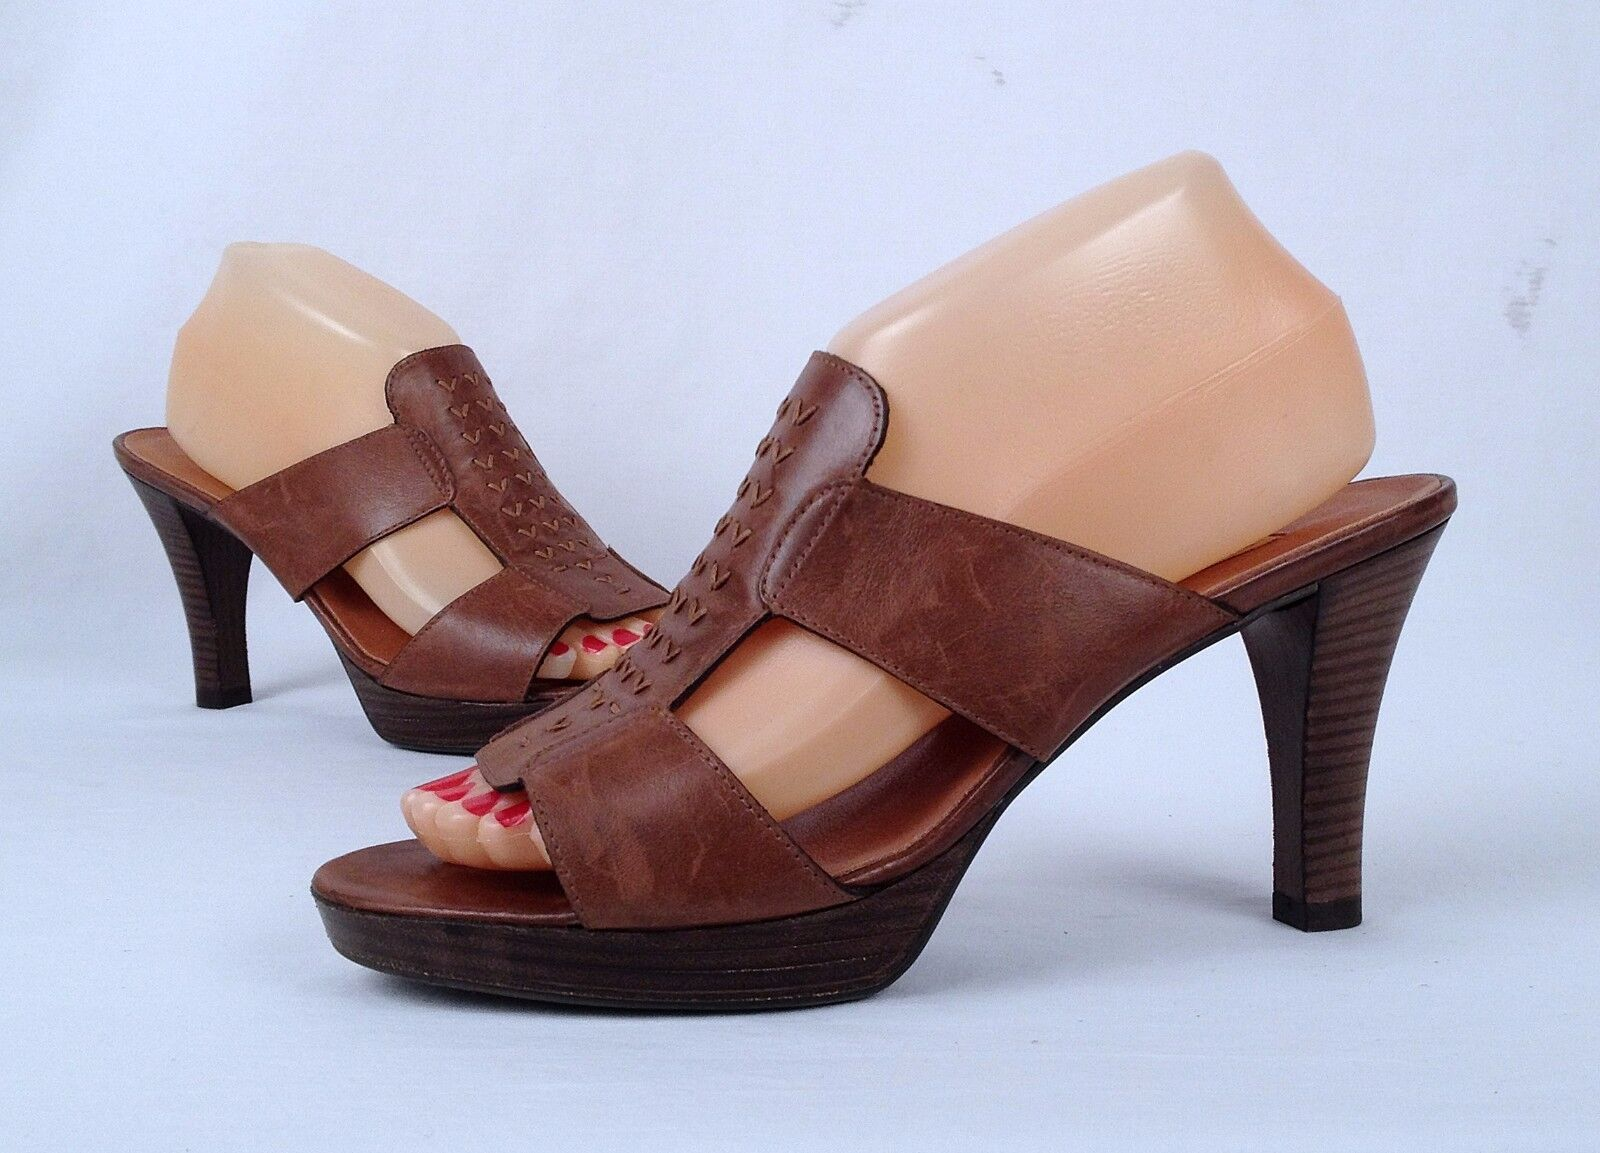 New   Paul Green 'Perla' Sandal- Brown-Choose Size-   (02)